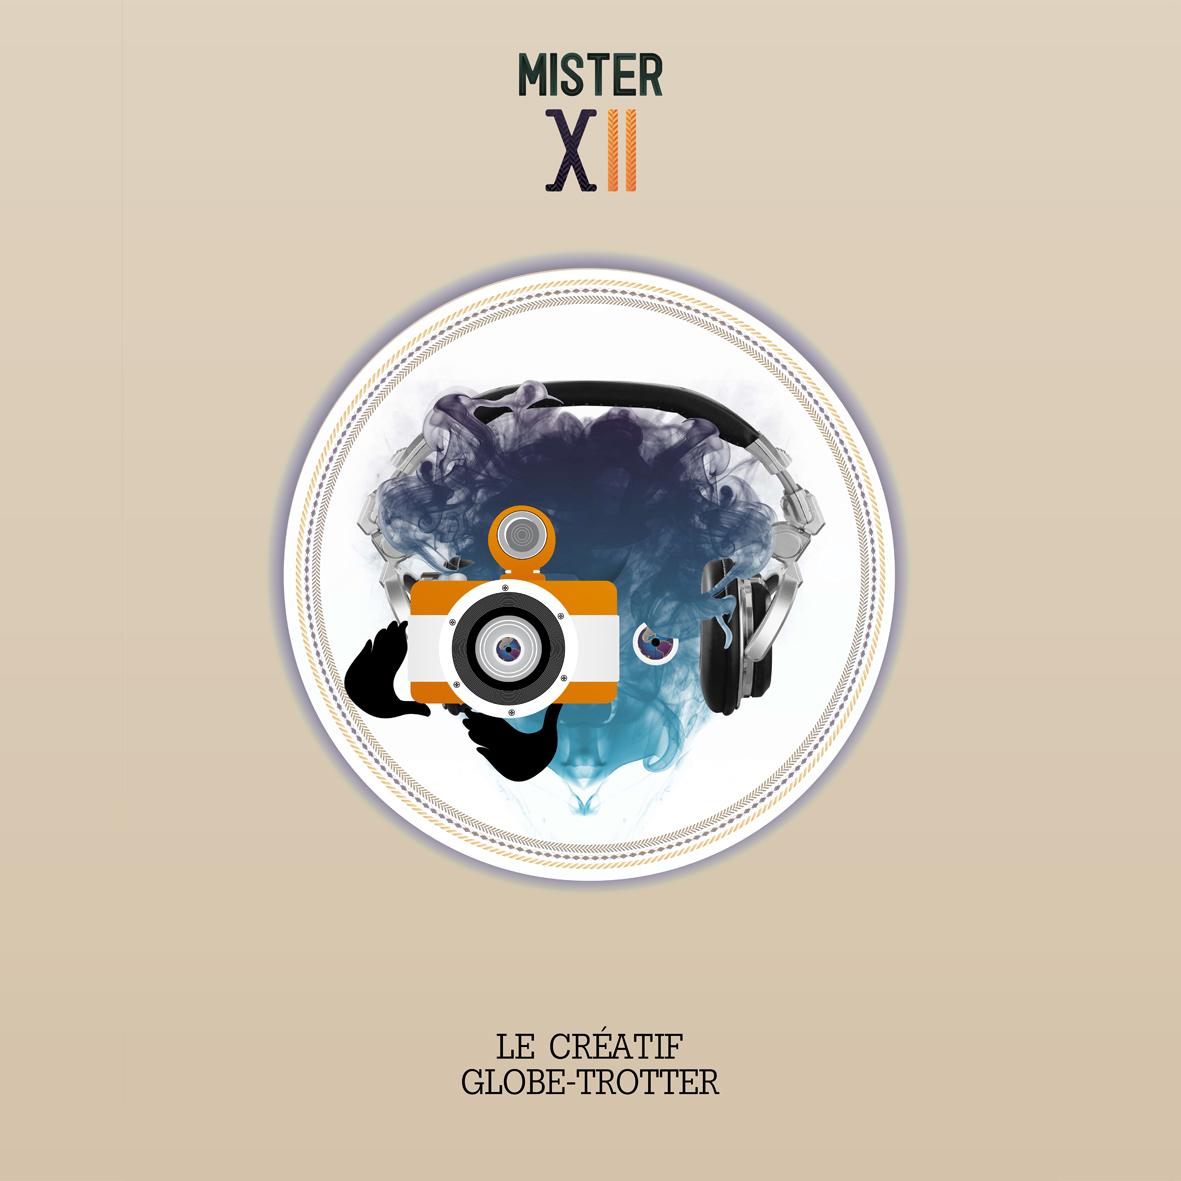 Mister X II